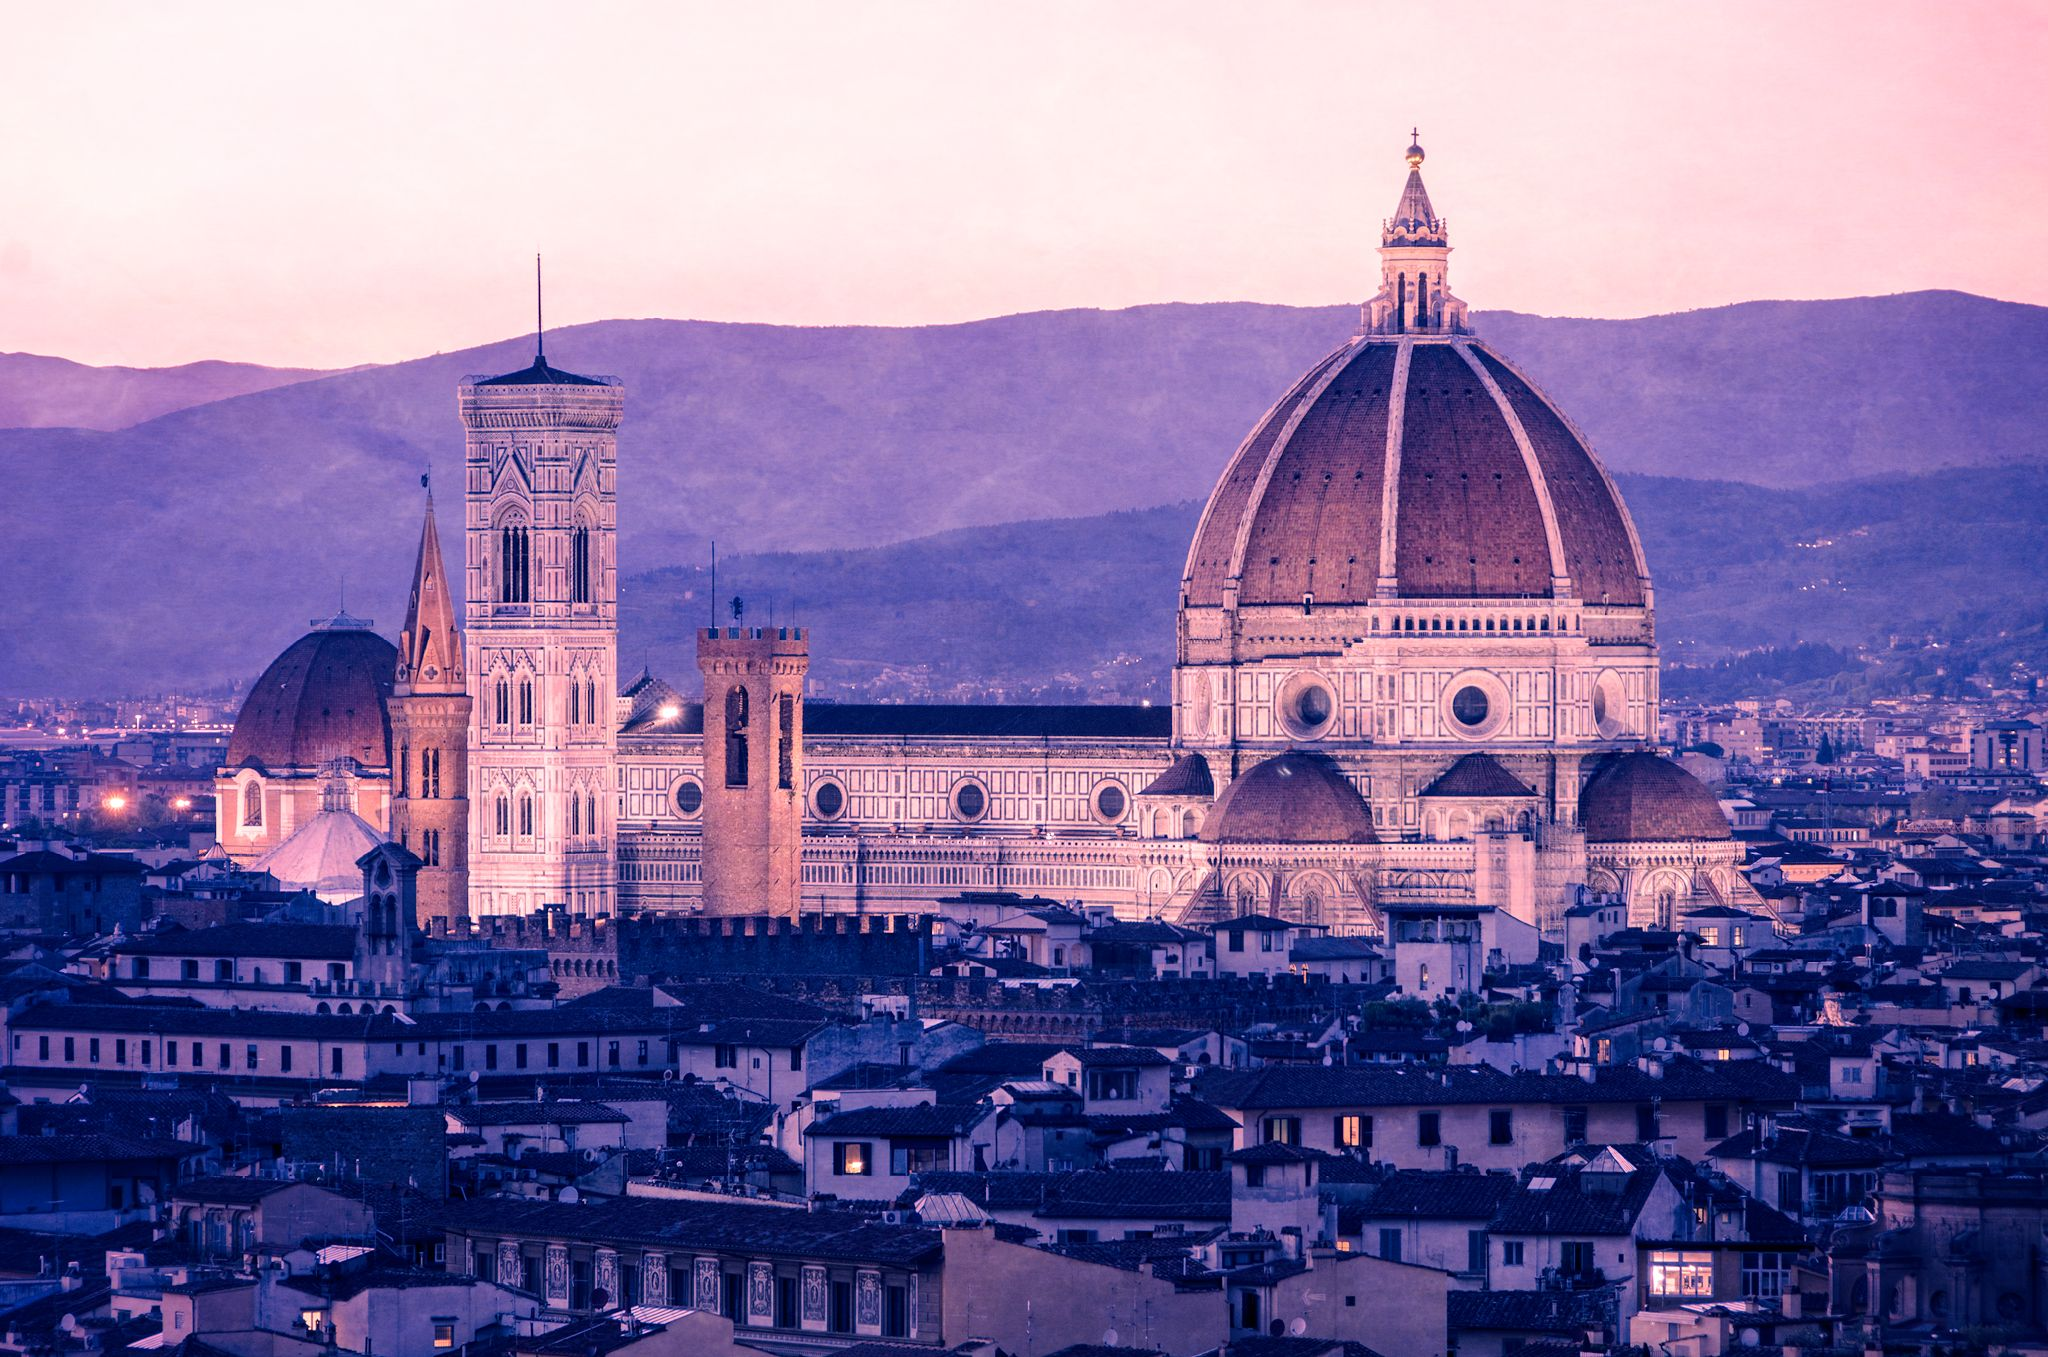 Scott-Davenport-Italy-Florence-2014-04-15-0487-PlumCrazy.jpg